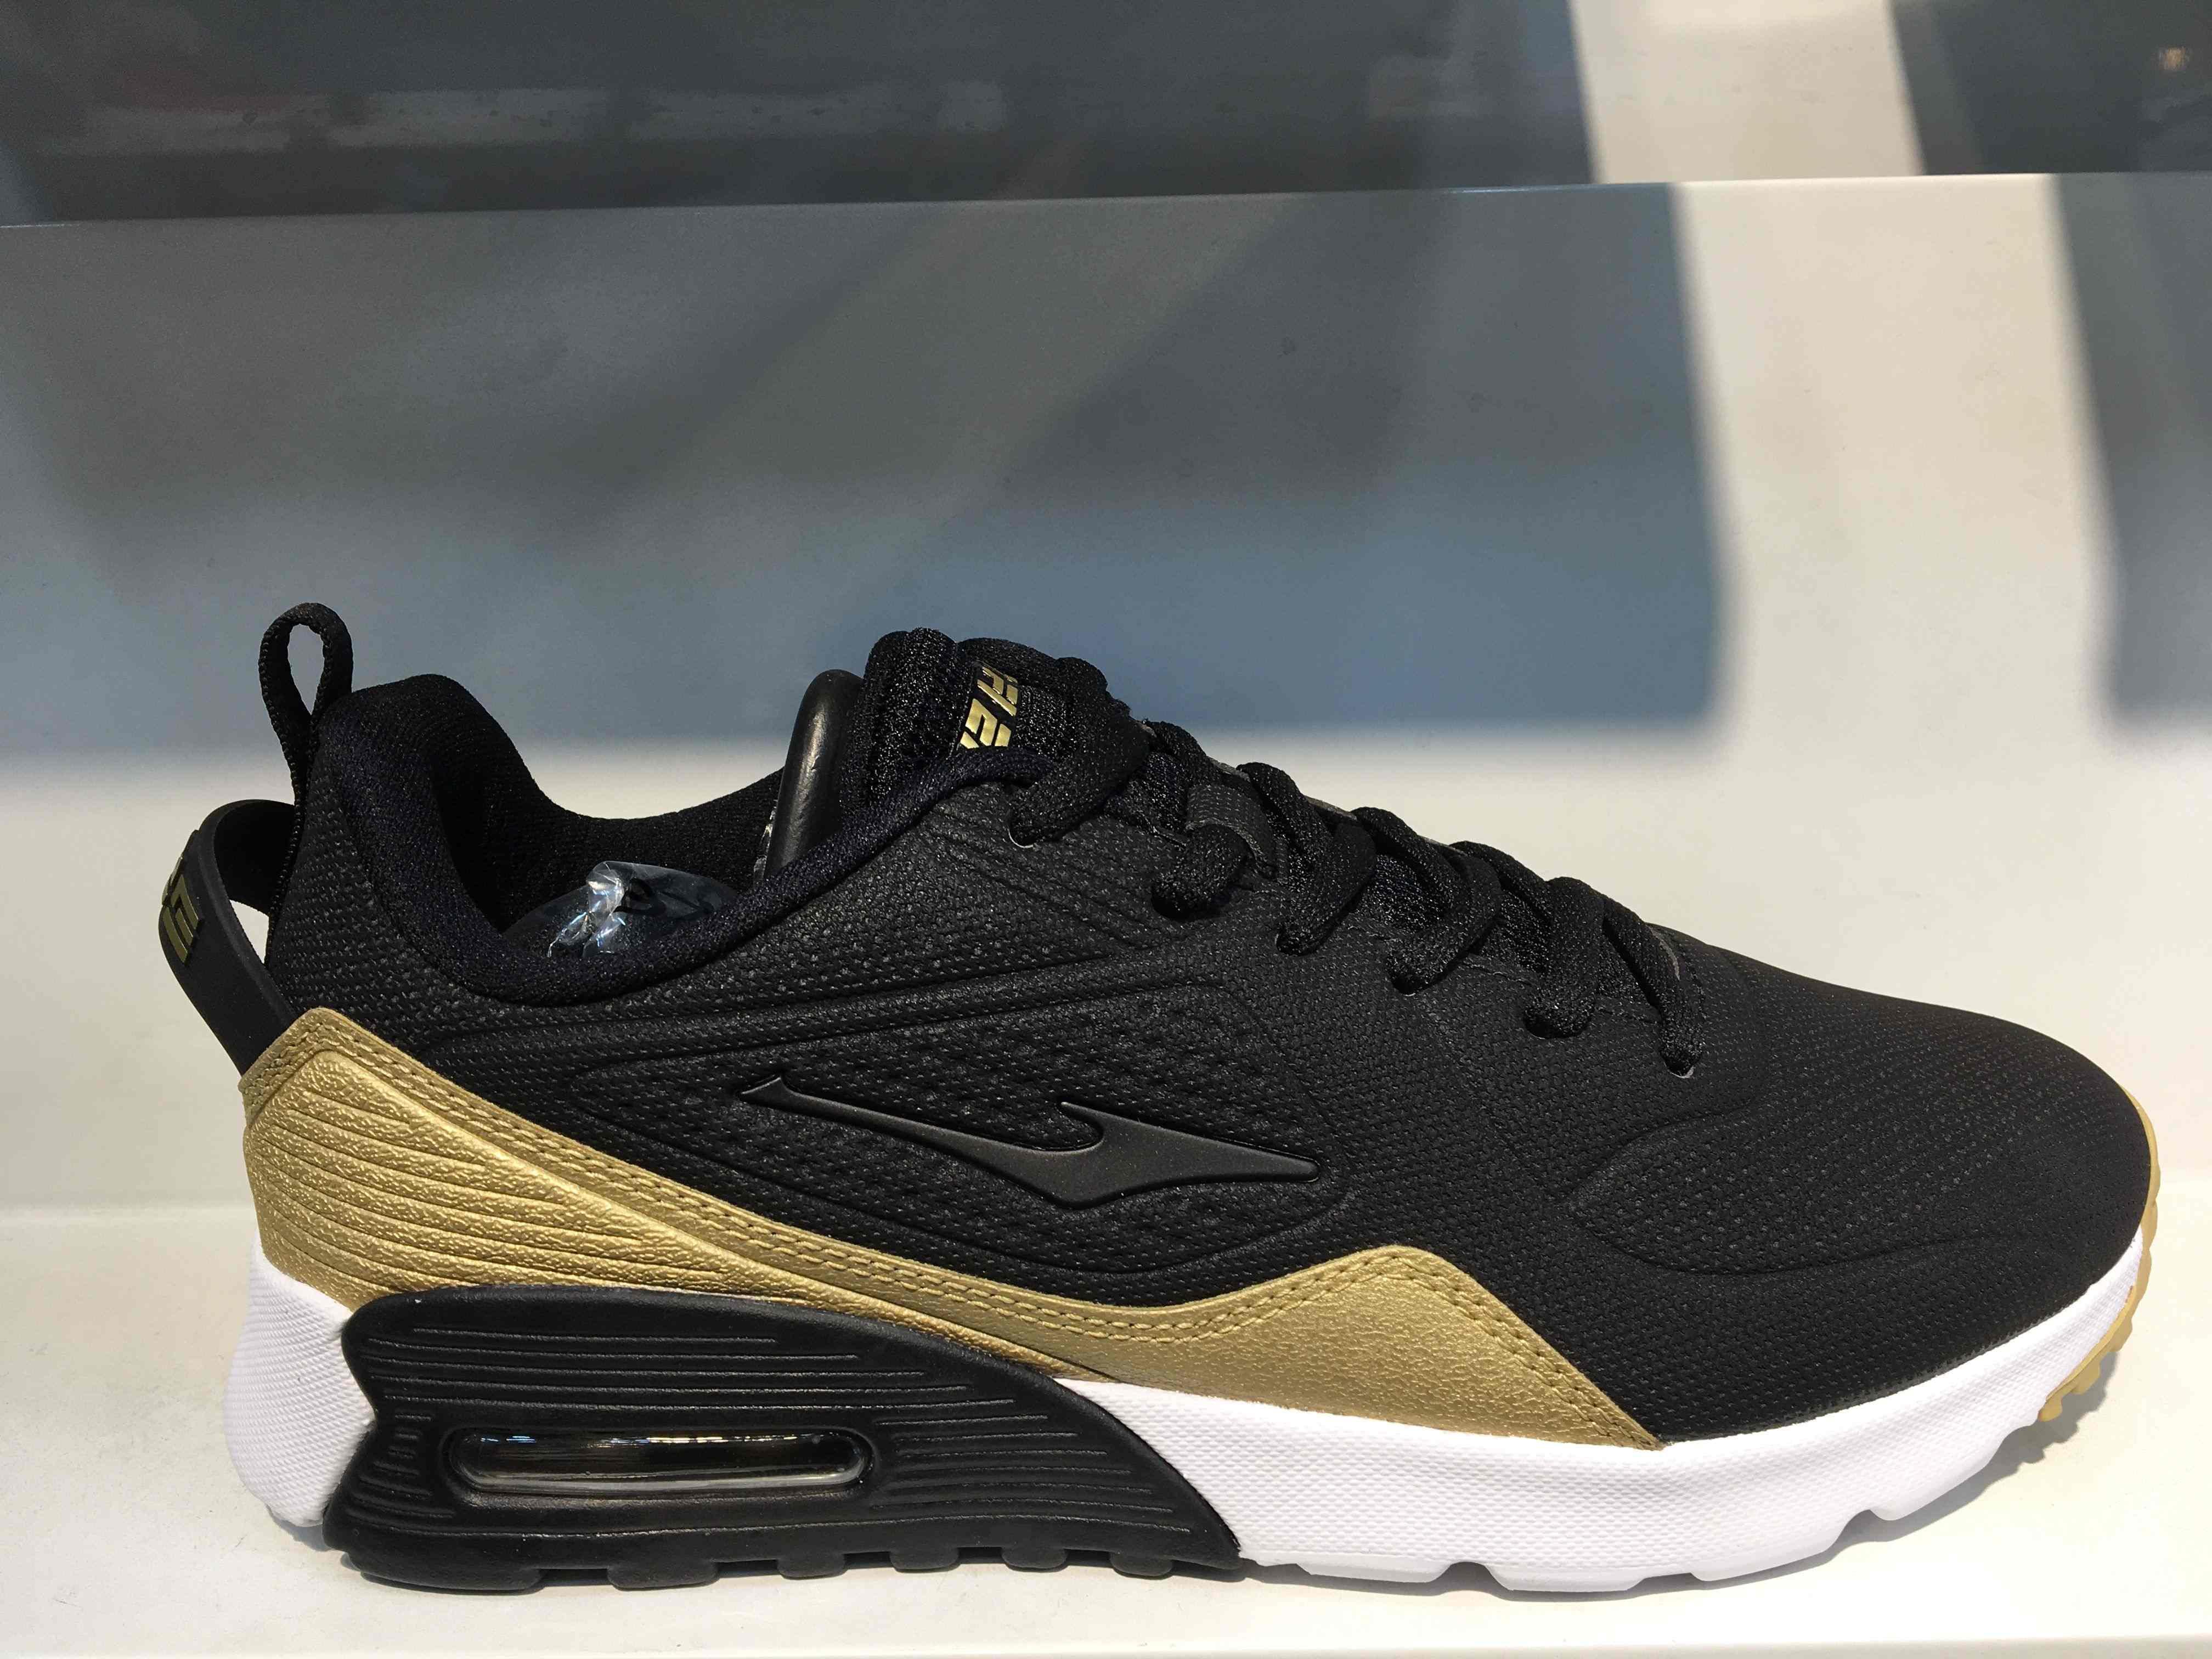 ERKE Cushioning Running Shoes for Men 11119420159-005